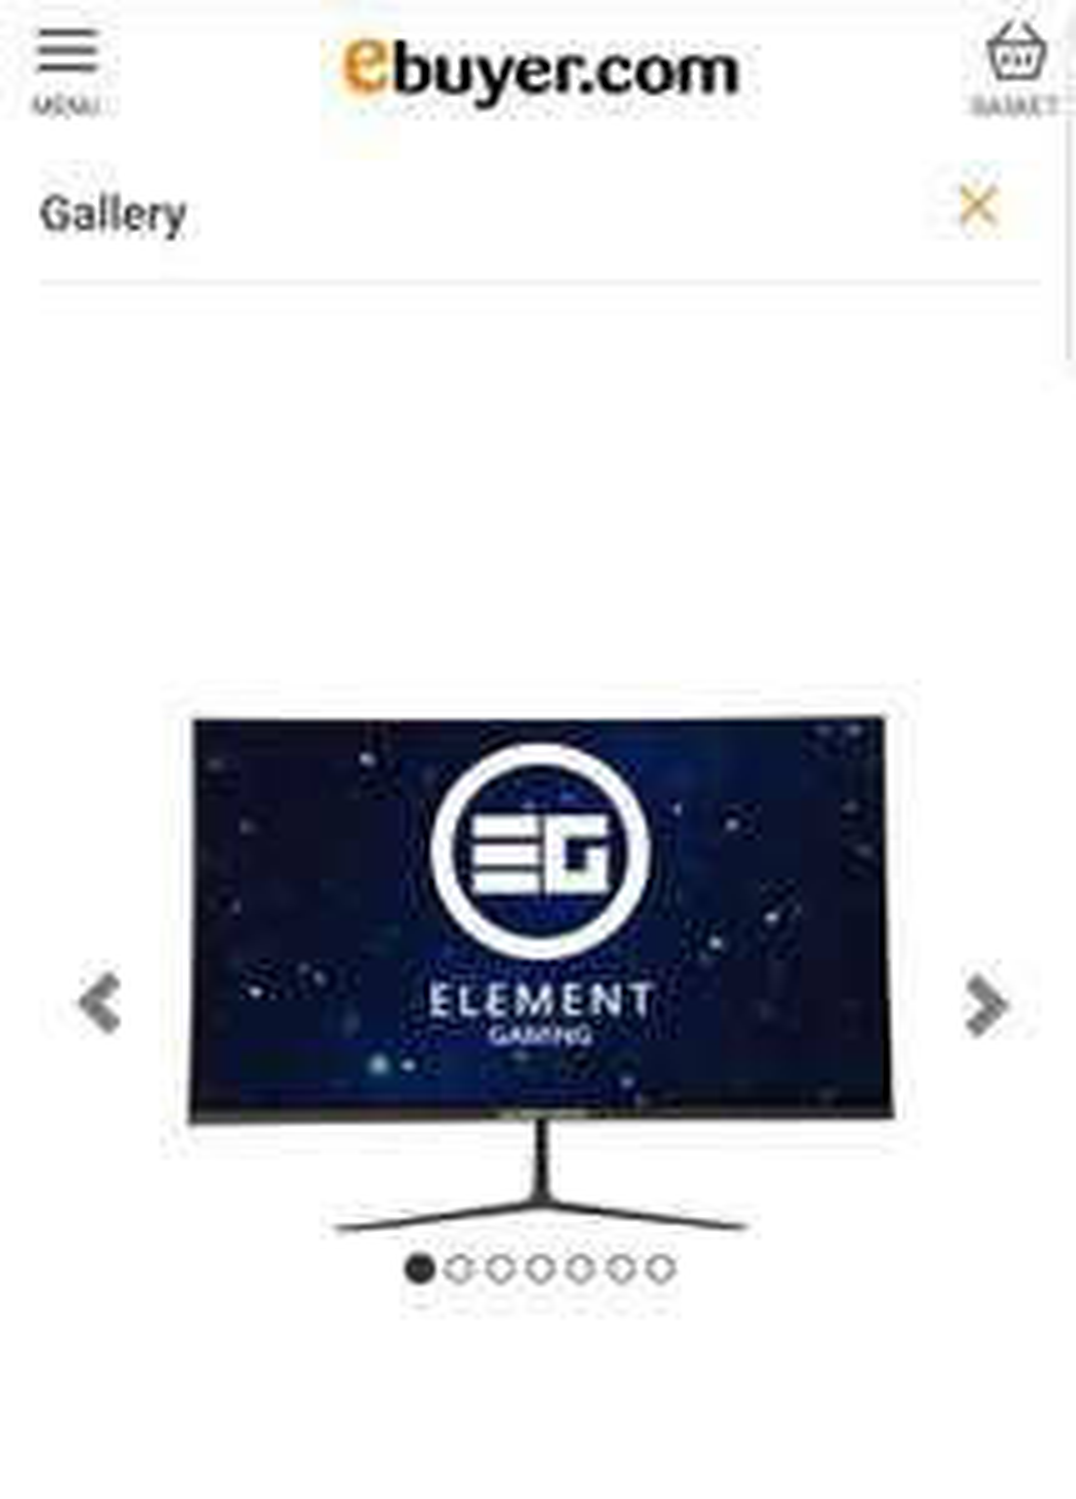 "Element Gaming 27"" QHD 144hz 1ms Gaming Monitor - £269.98 @ Ebuyer"